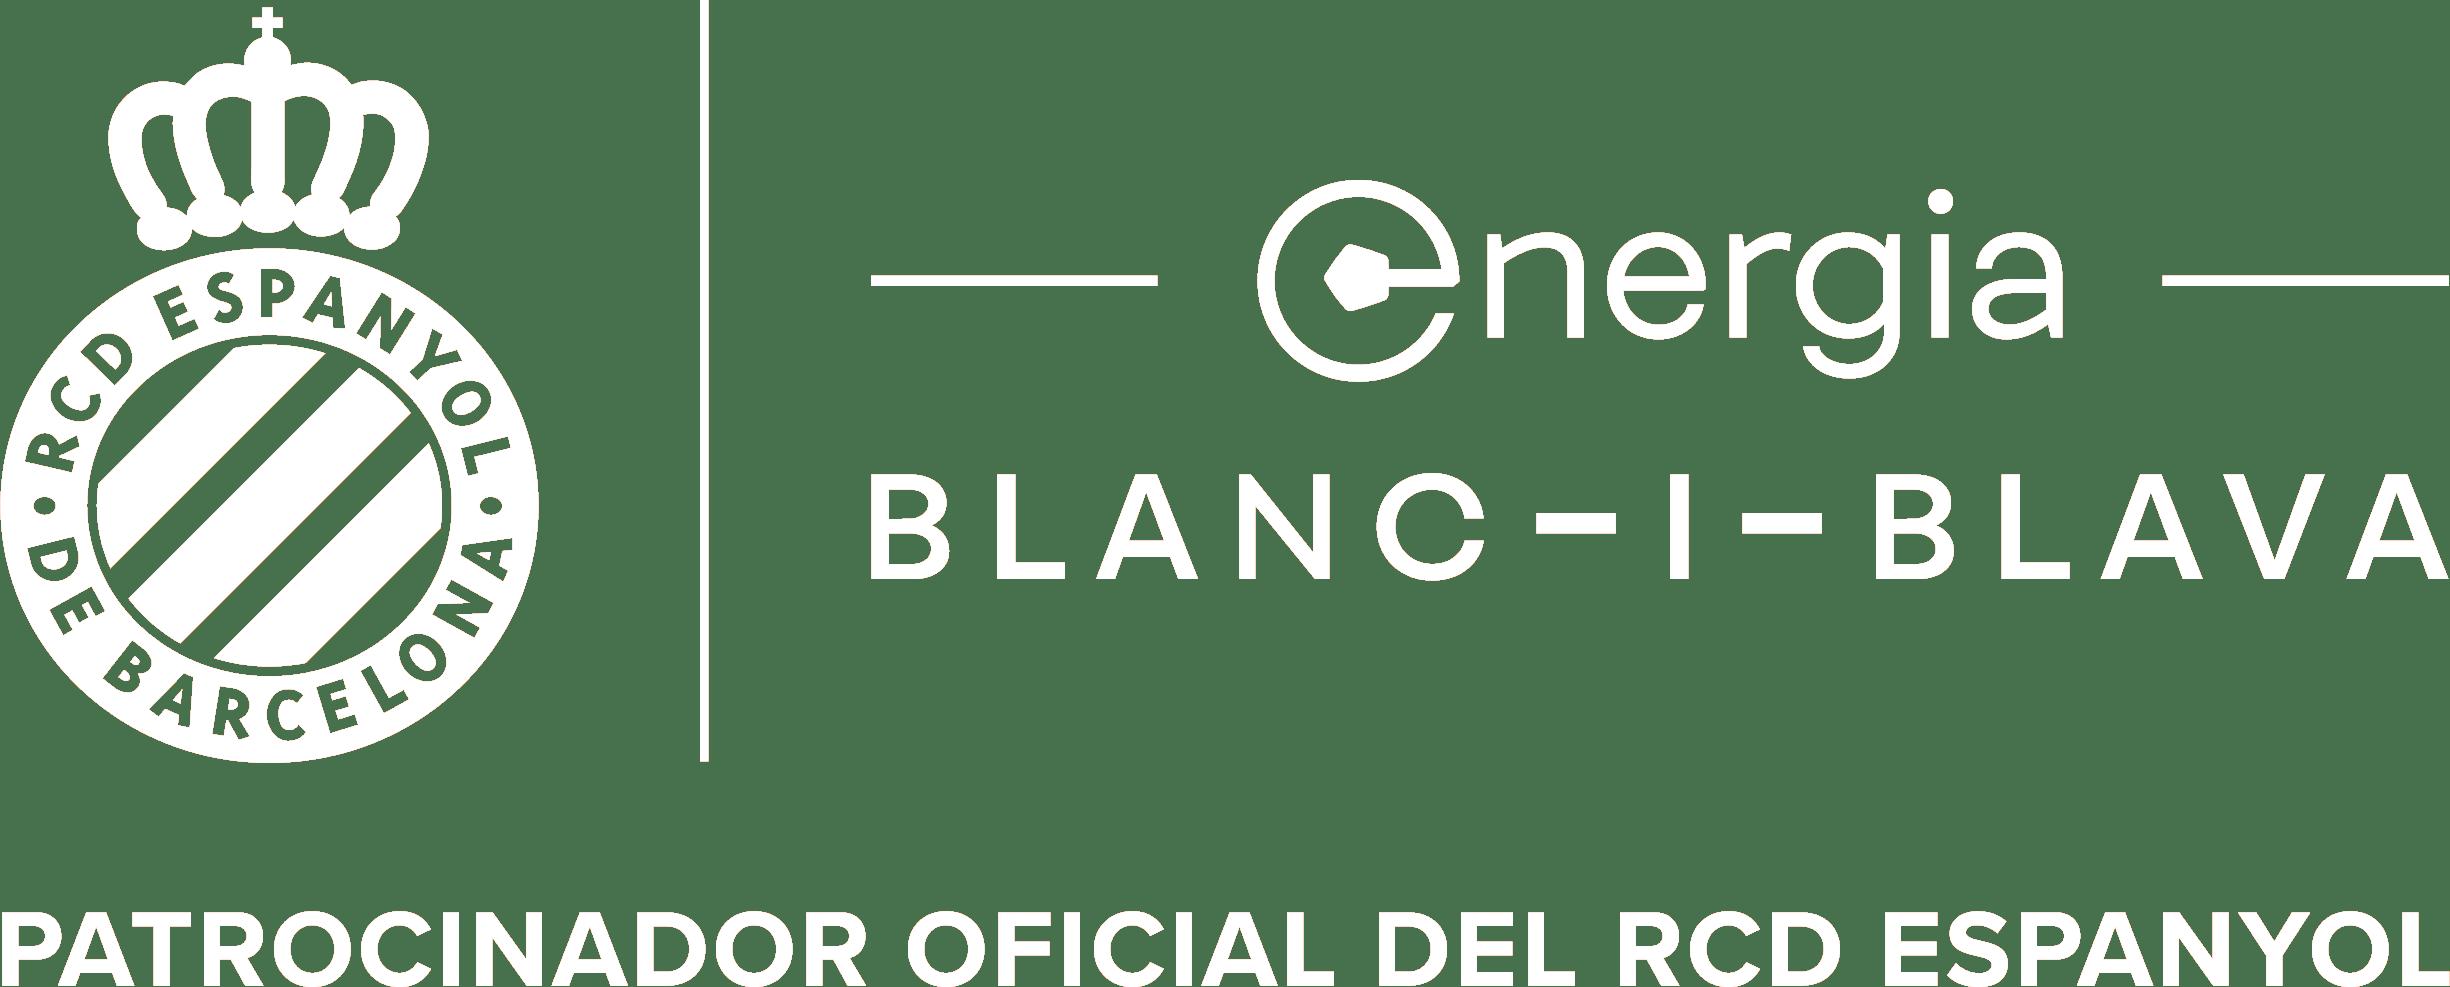 Ebb_logo_blanco